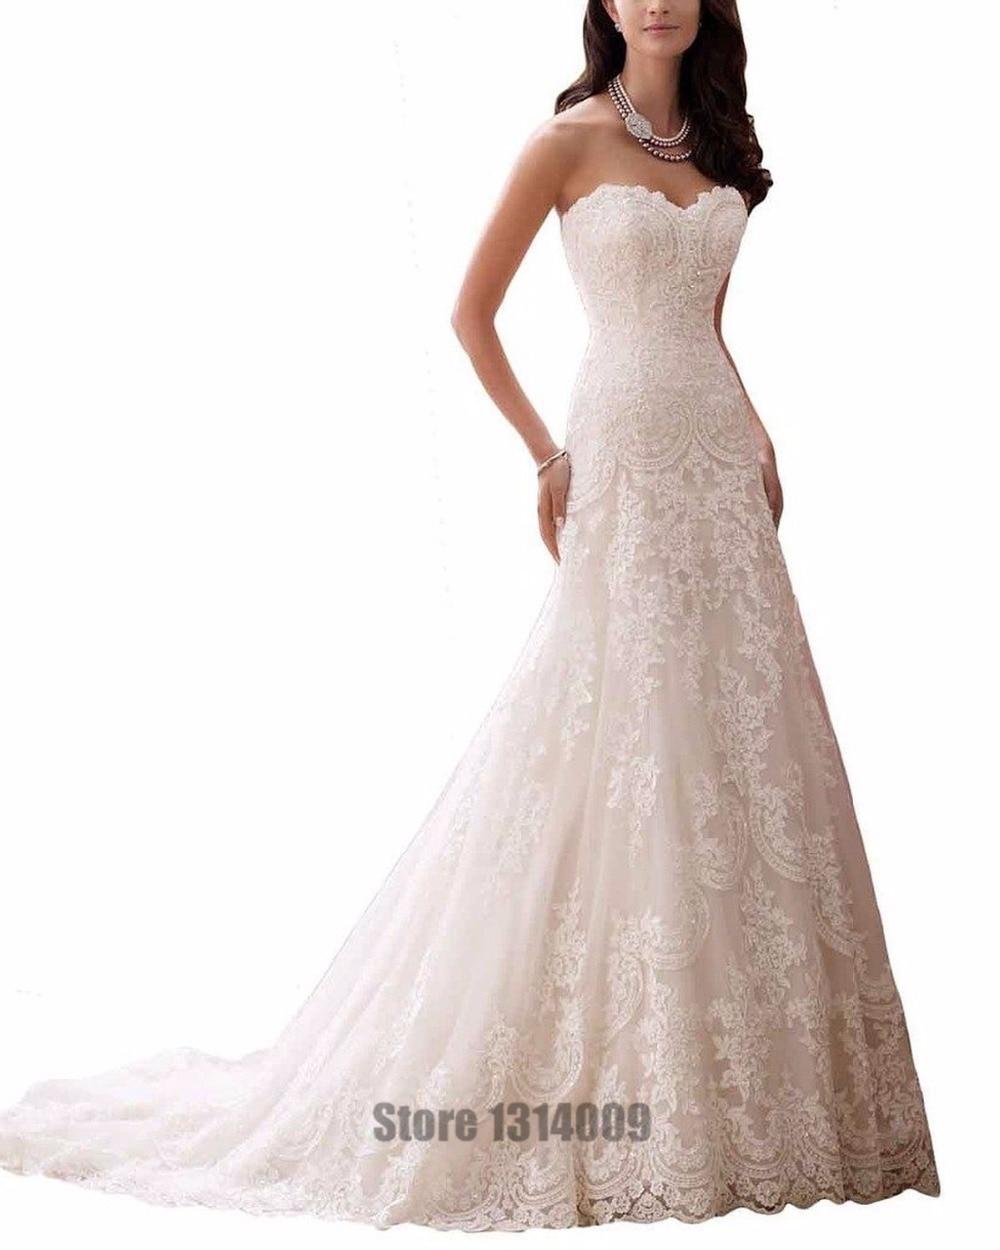 a7c995556d Cheap Wedding Dresses Amazon - raveitsafe